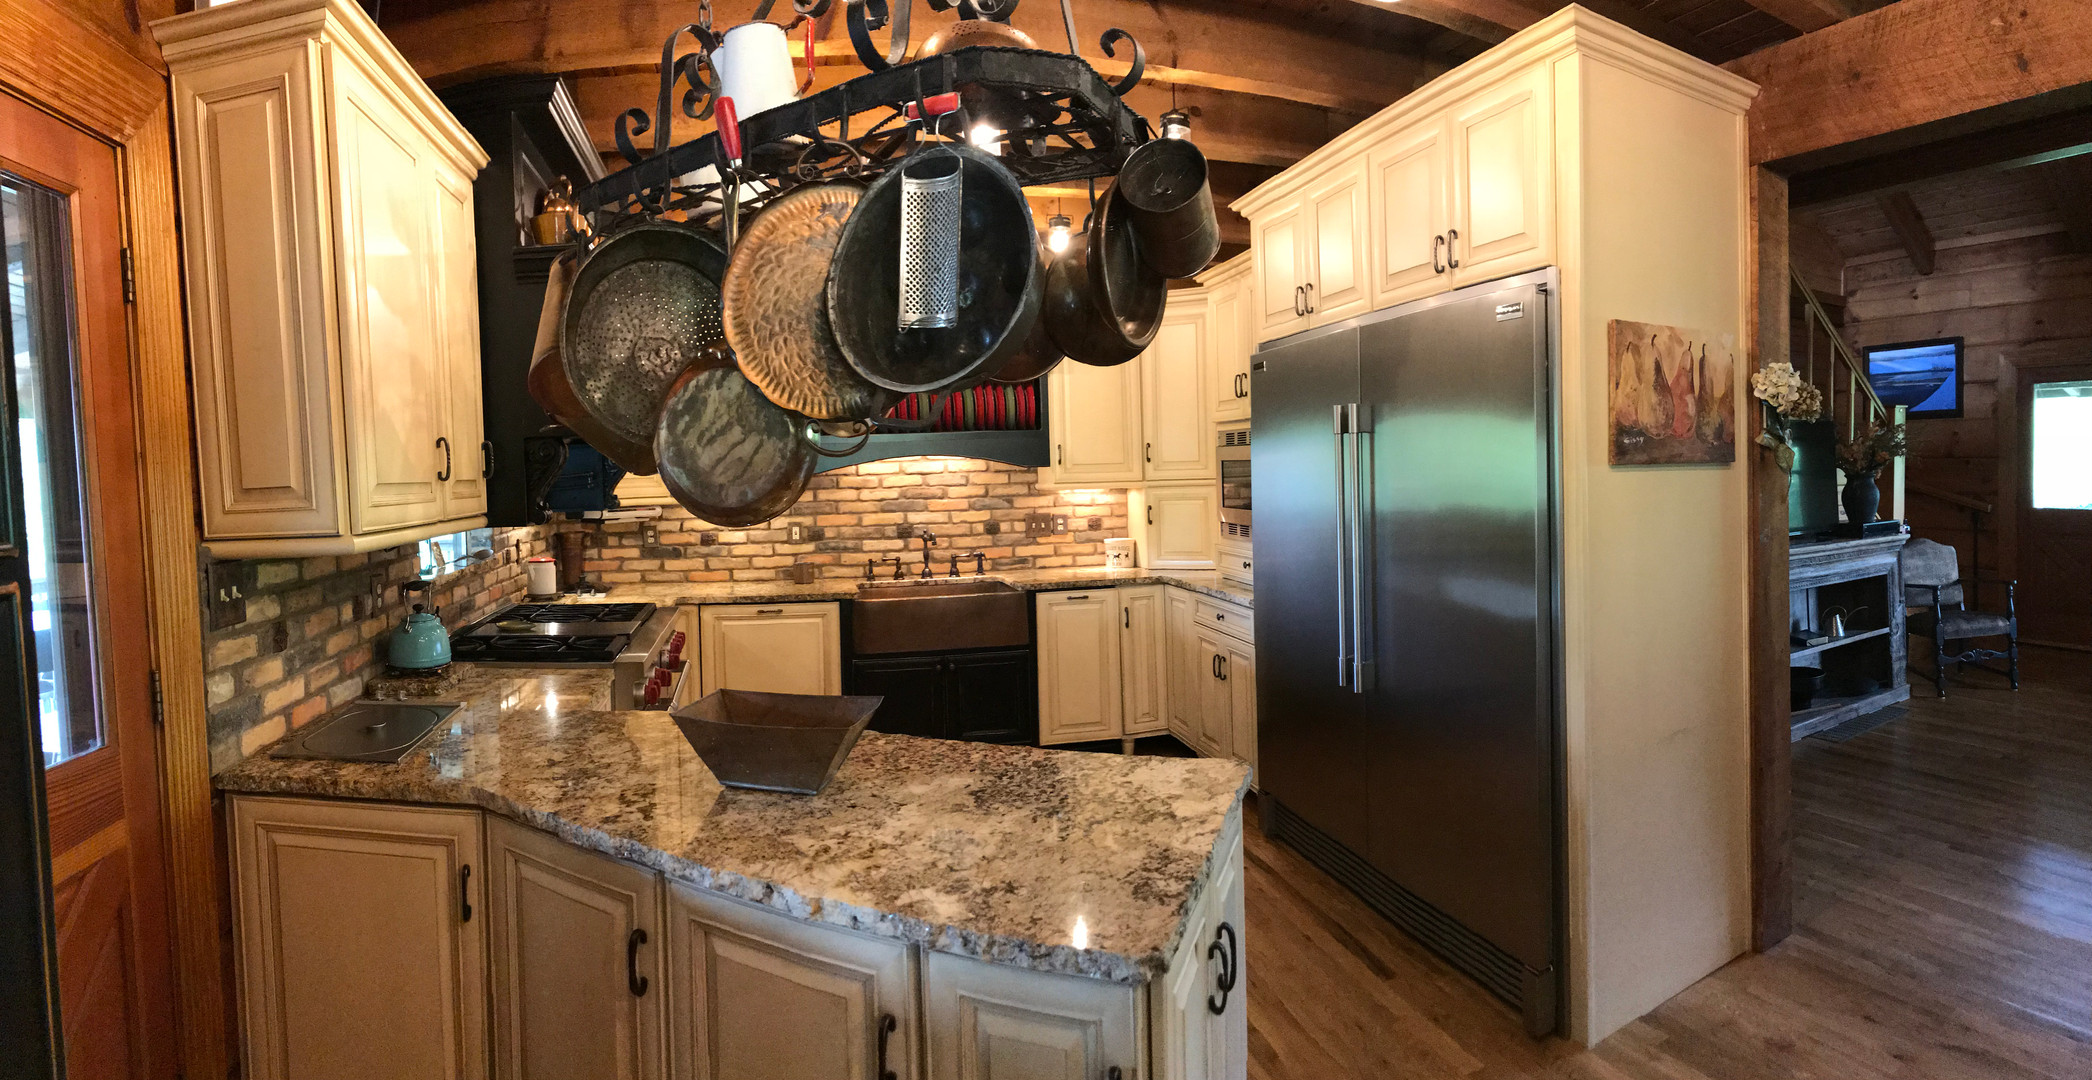 Lodge kitchen fridge